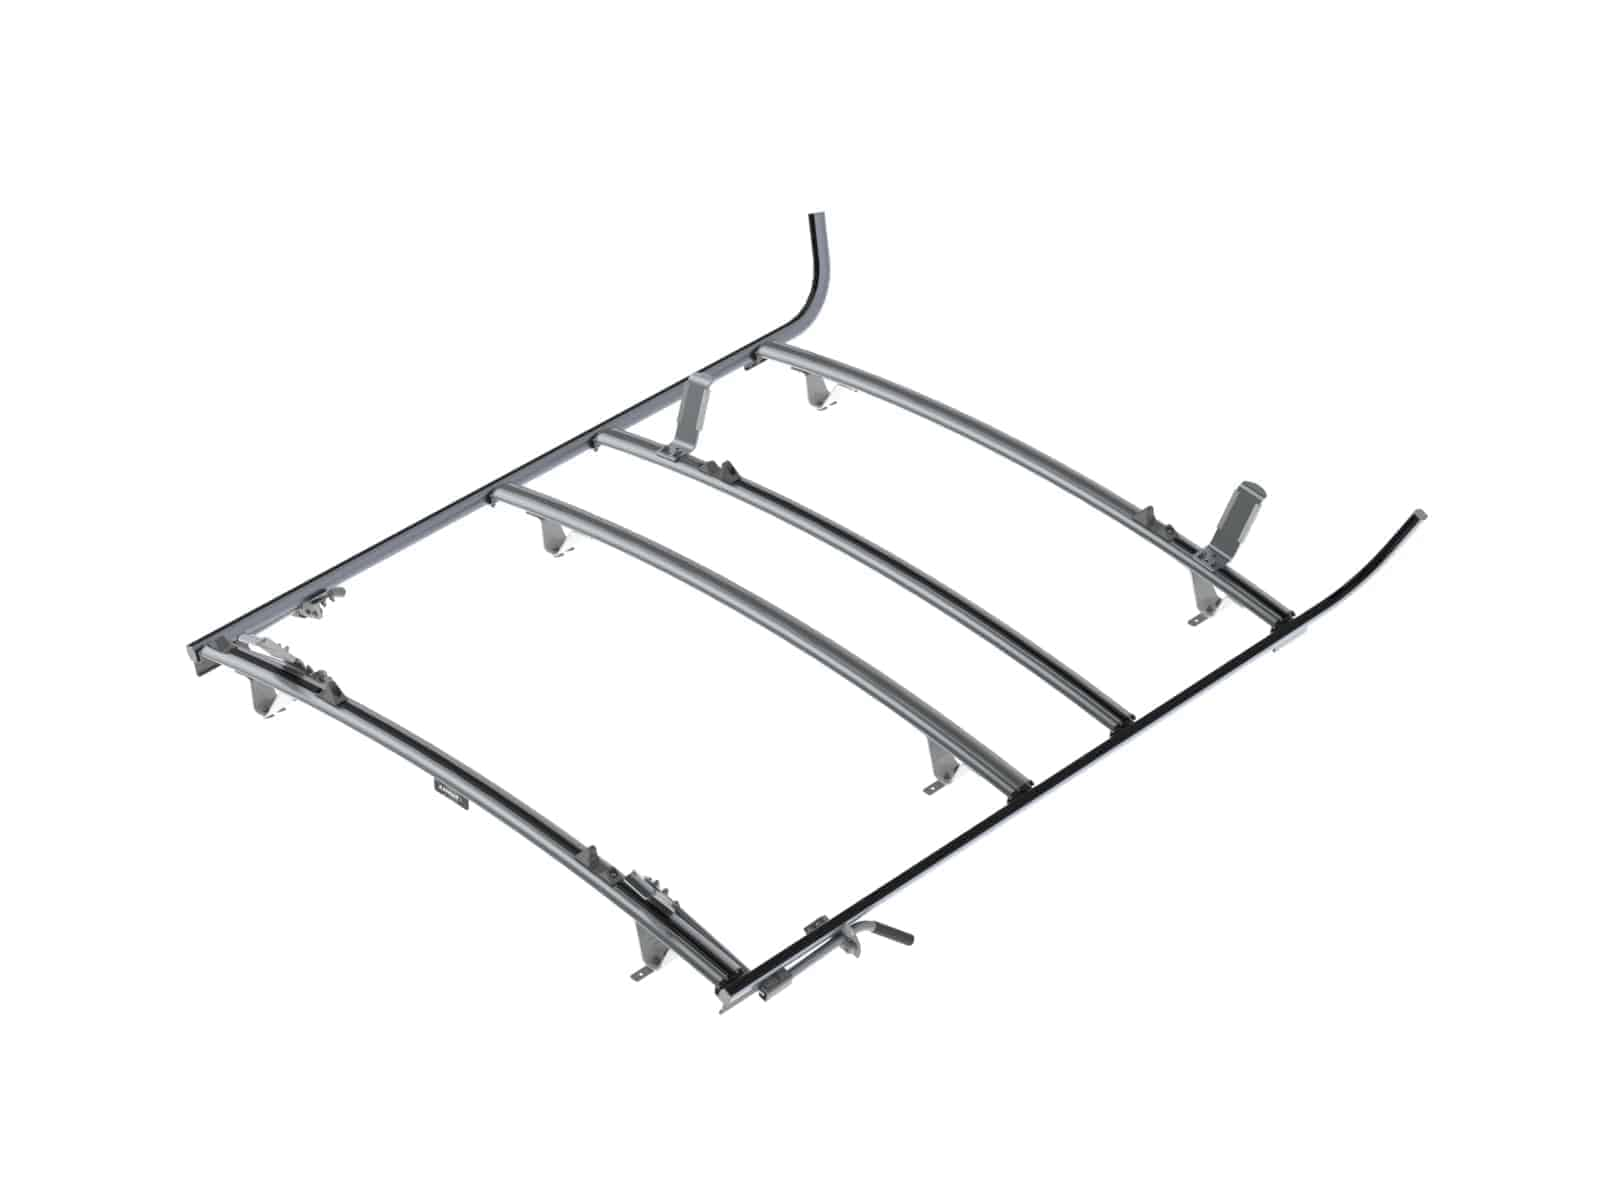 Combination Mercedes Sprinter Ladder Rack 3 Bar System